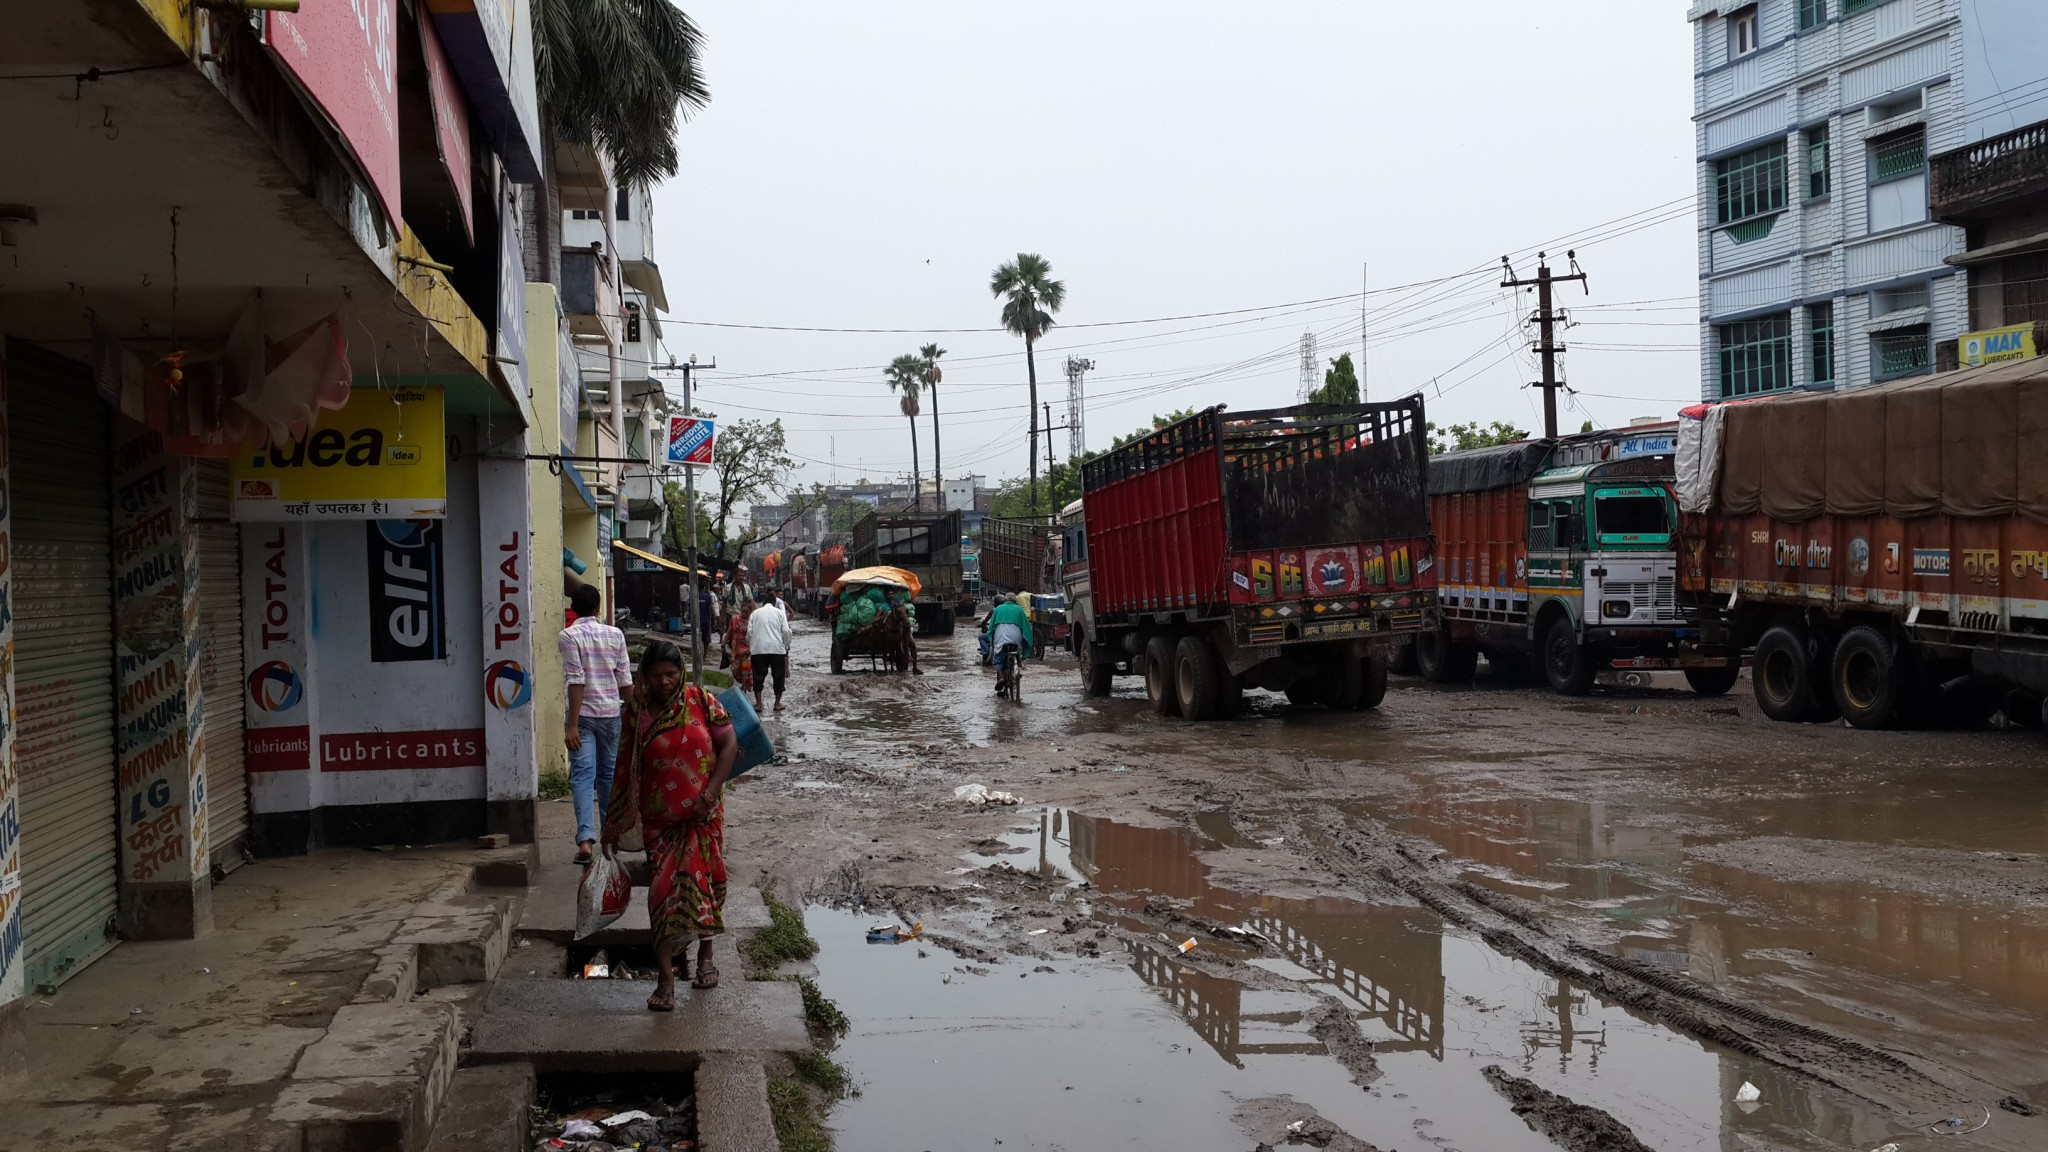 The disgusting Streets of Raxhaul.